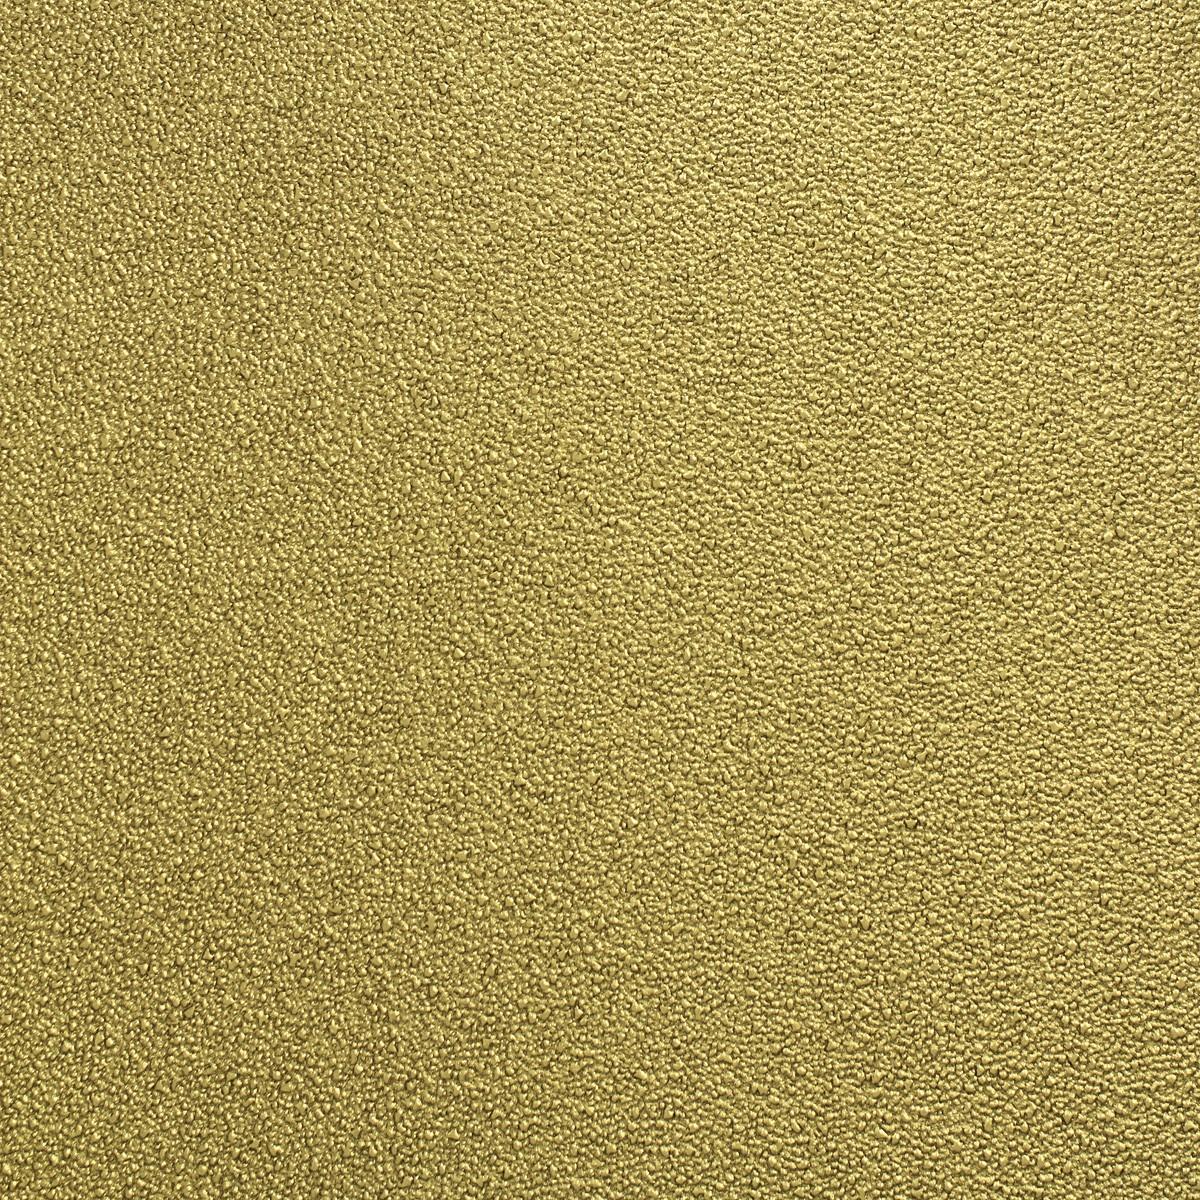 Harald Gloockler Wallpaper Gold Plain Texture